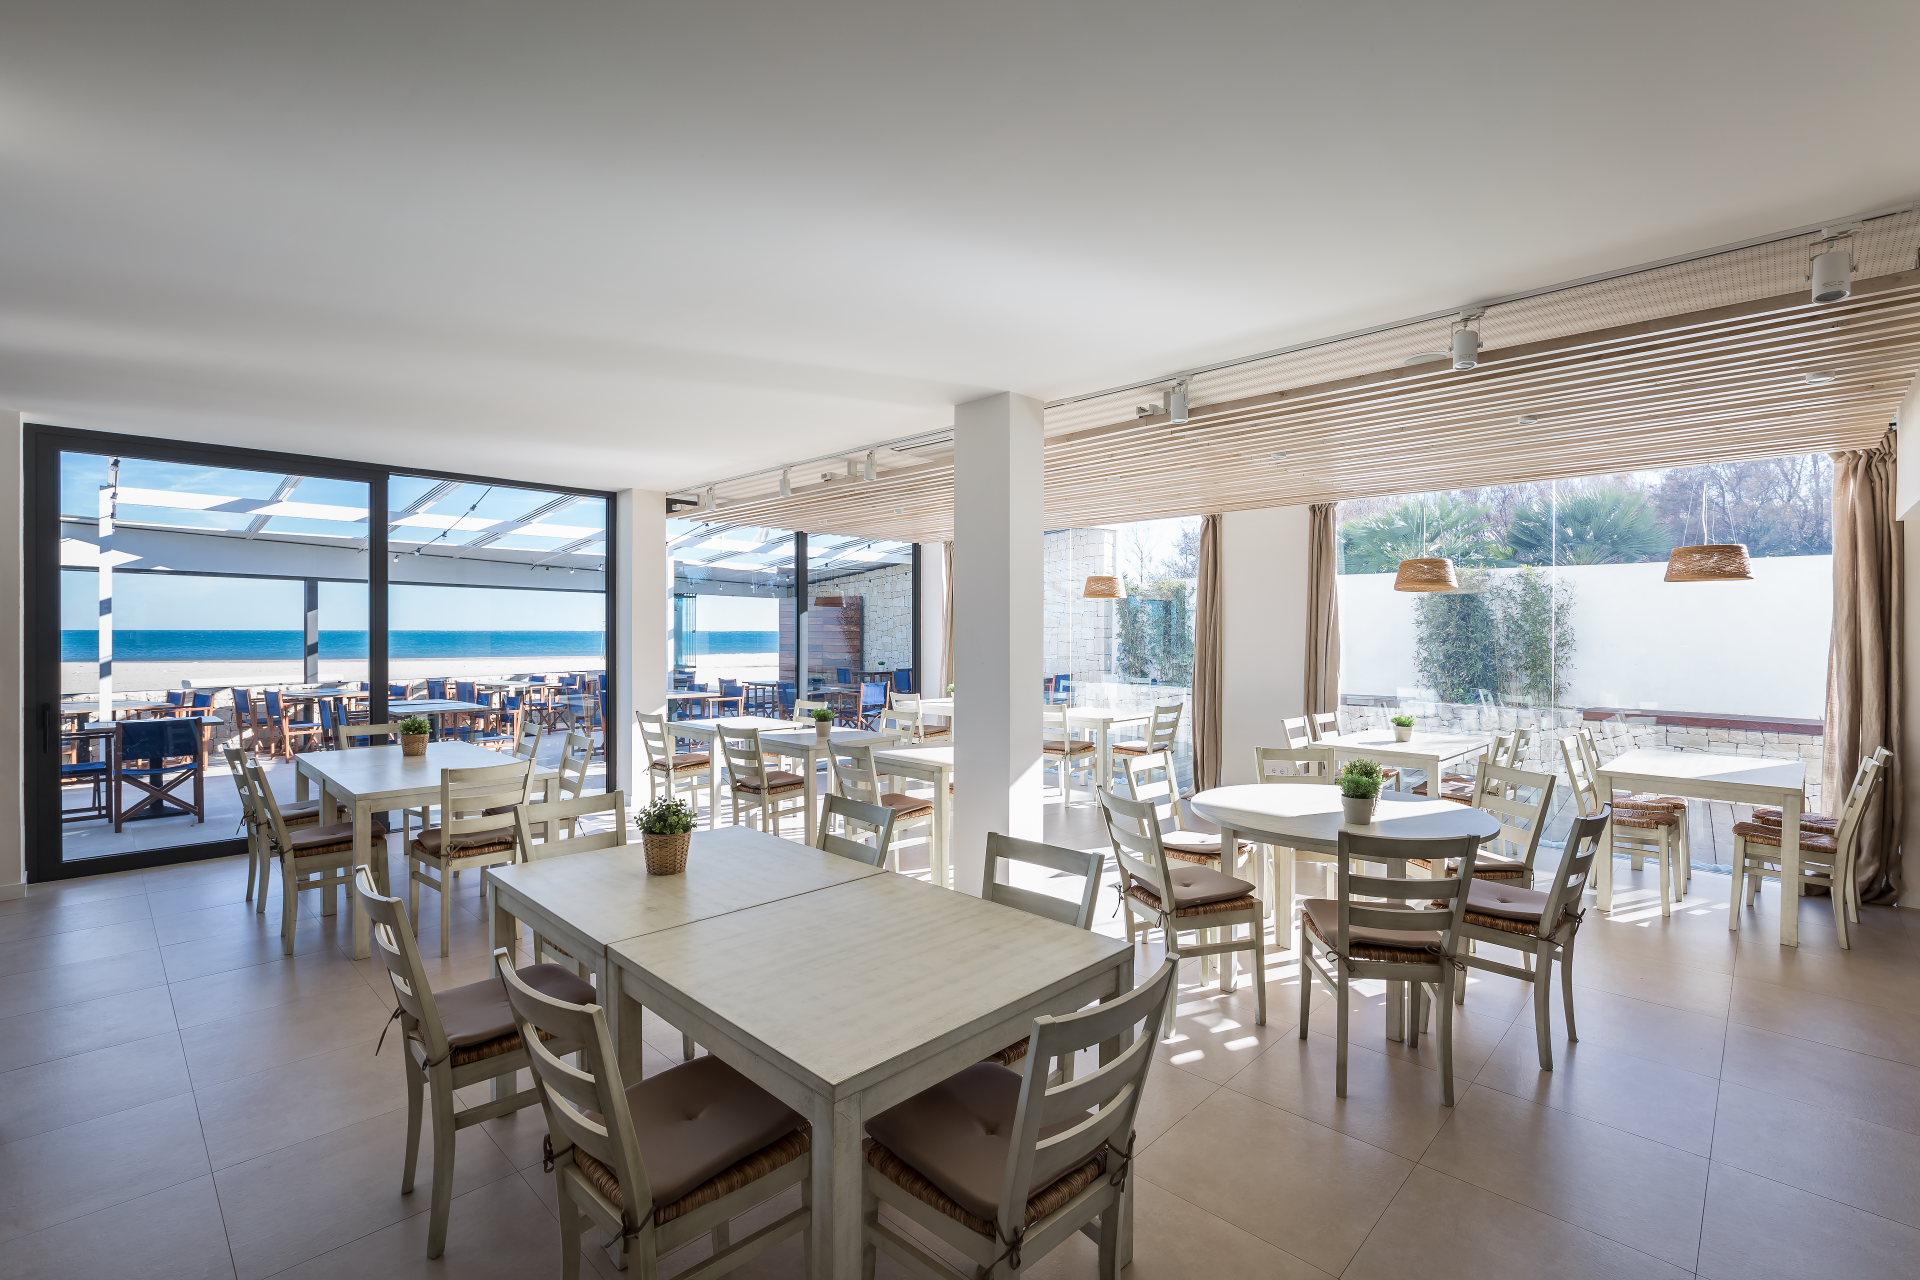 fotografia-arquitectura-valencia-german-cabo-versea-restaurante-ferrera-pinedo (12)